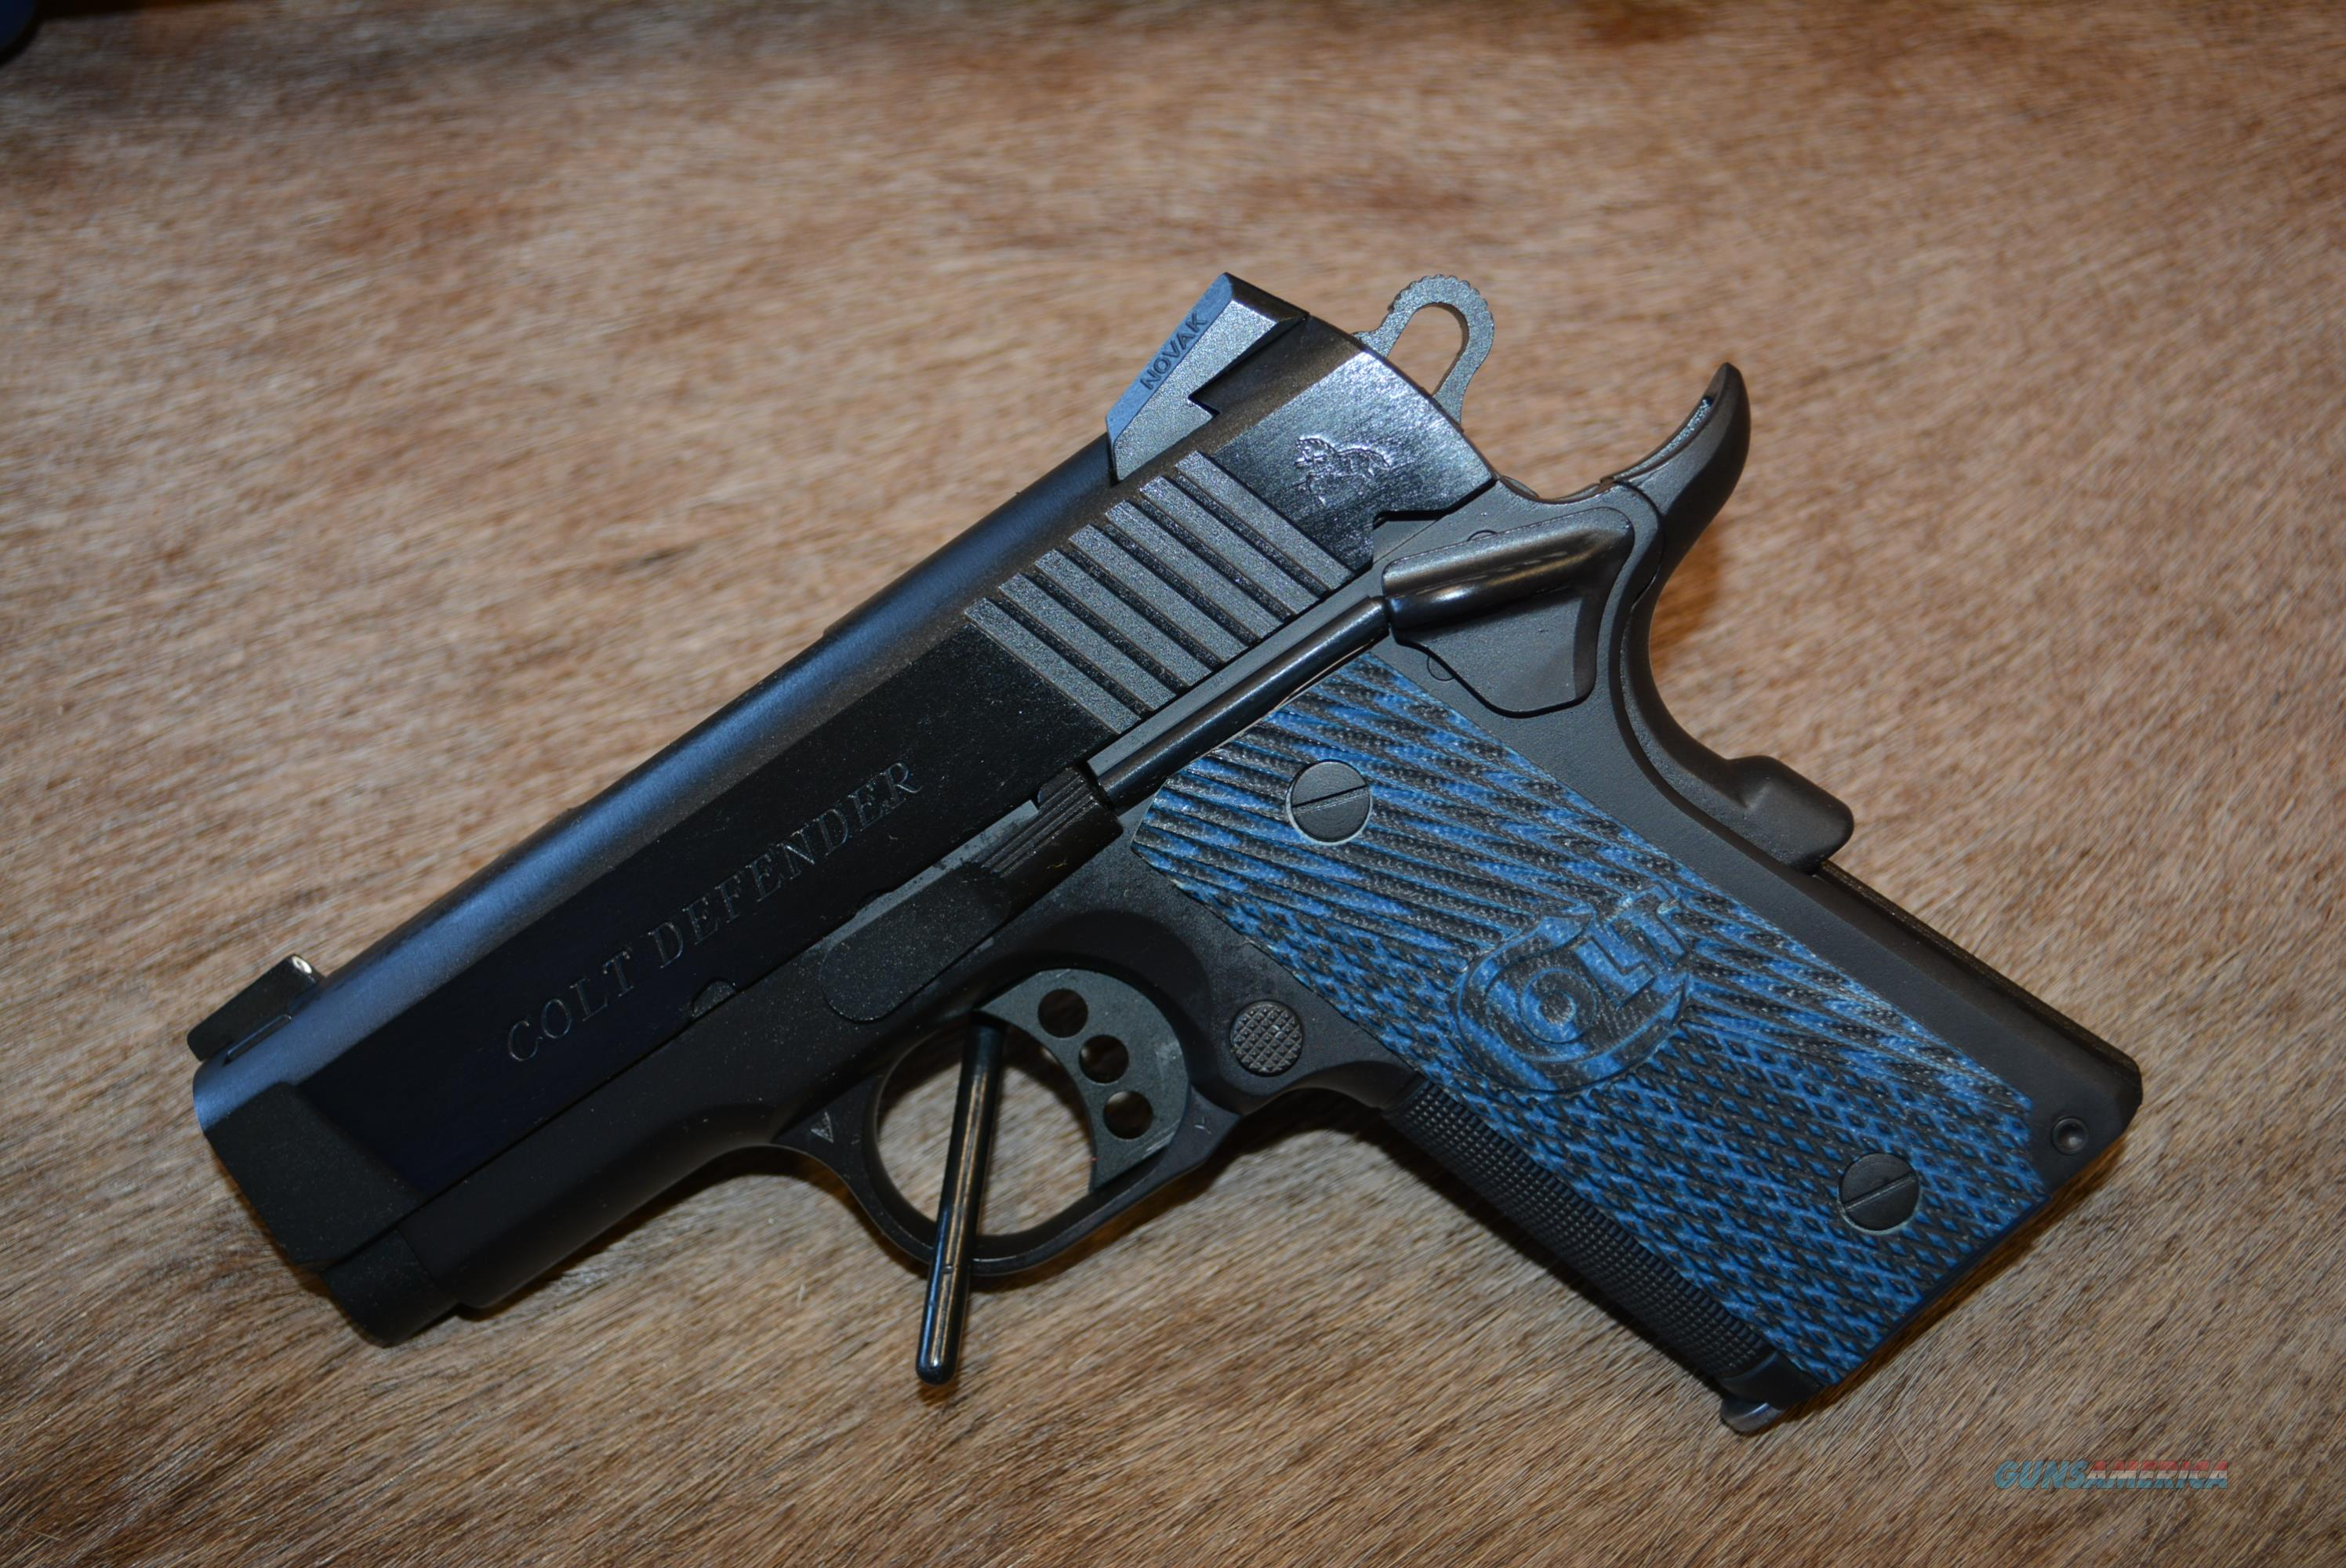 Colt LW Defender 9mm Limited Edition Gun  Guns > Pistols > Colt Automatic Pistols (1911 & Var)